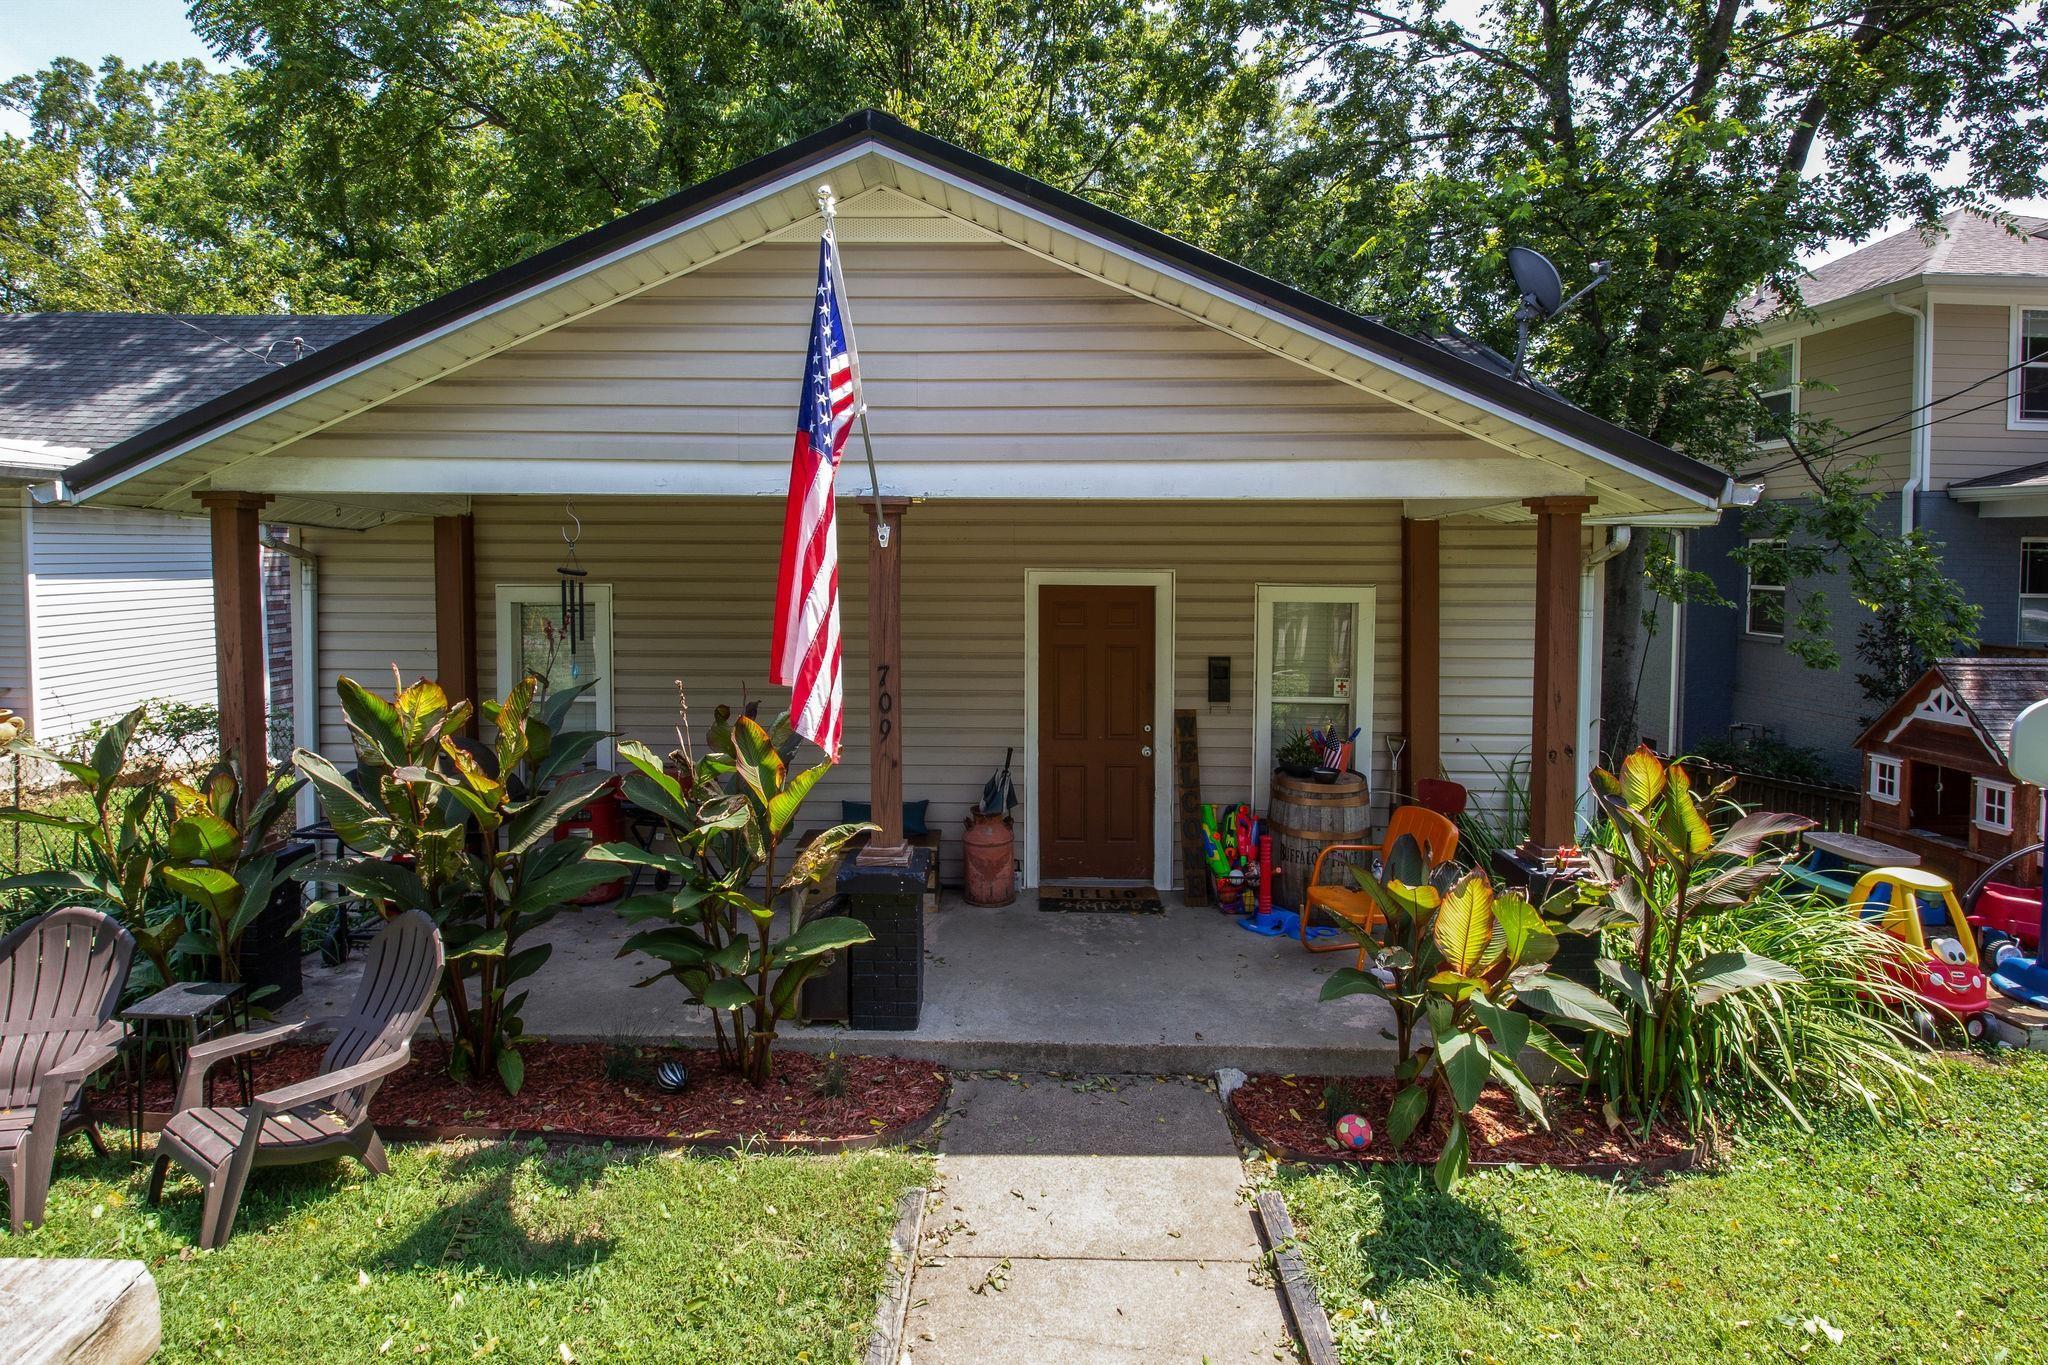 709 S 12th St, Nashville, TN 37206 - Nashville, TN real estate listing